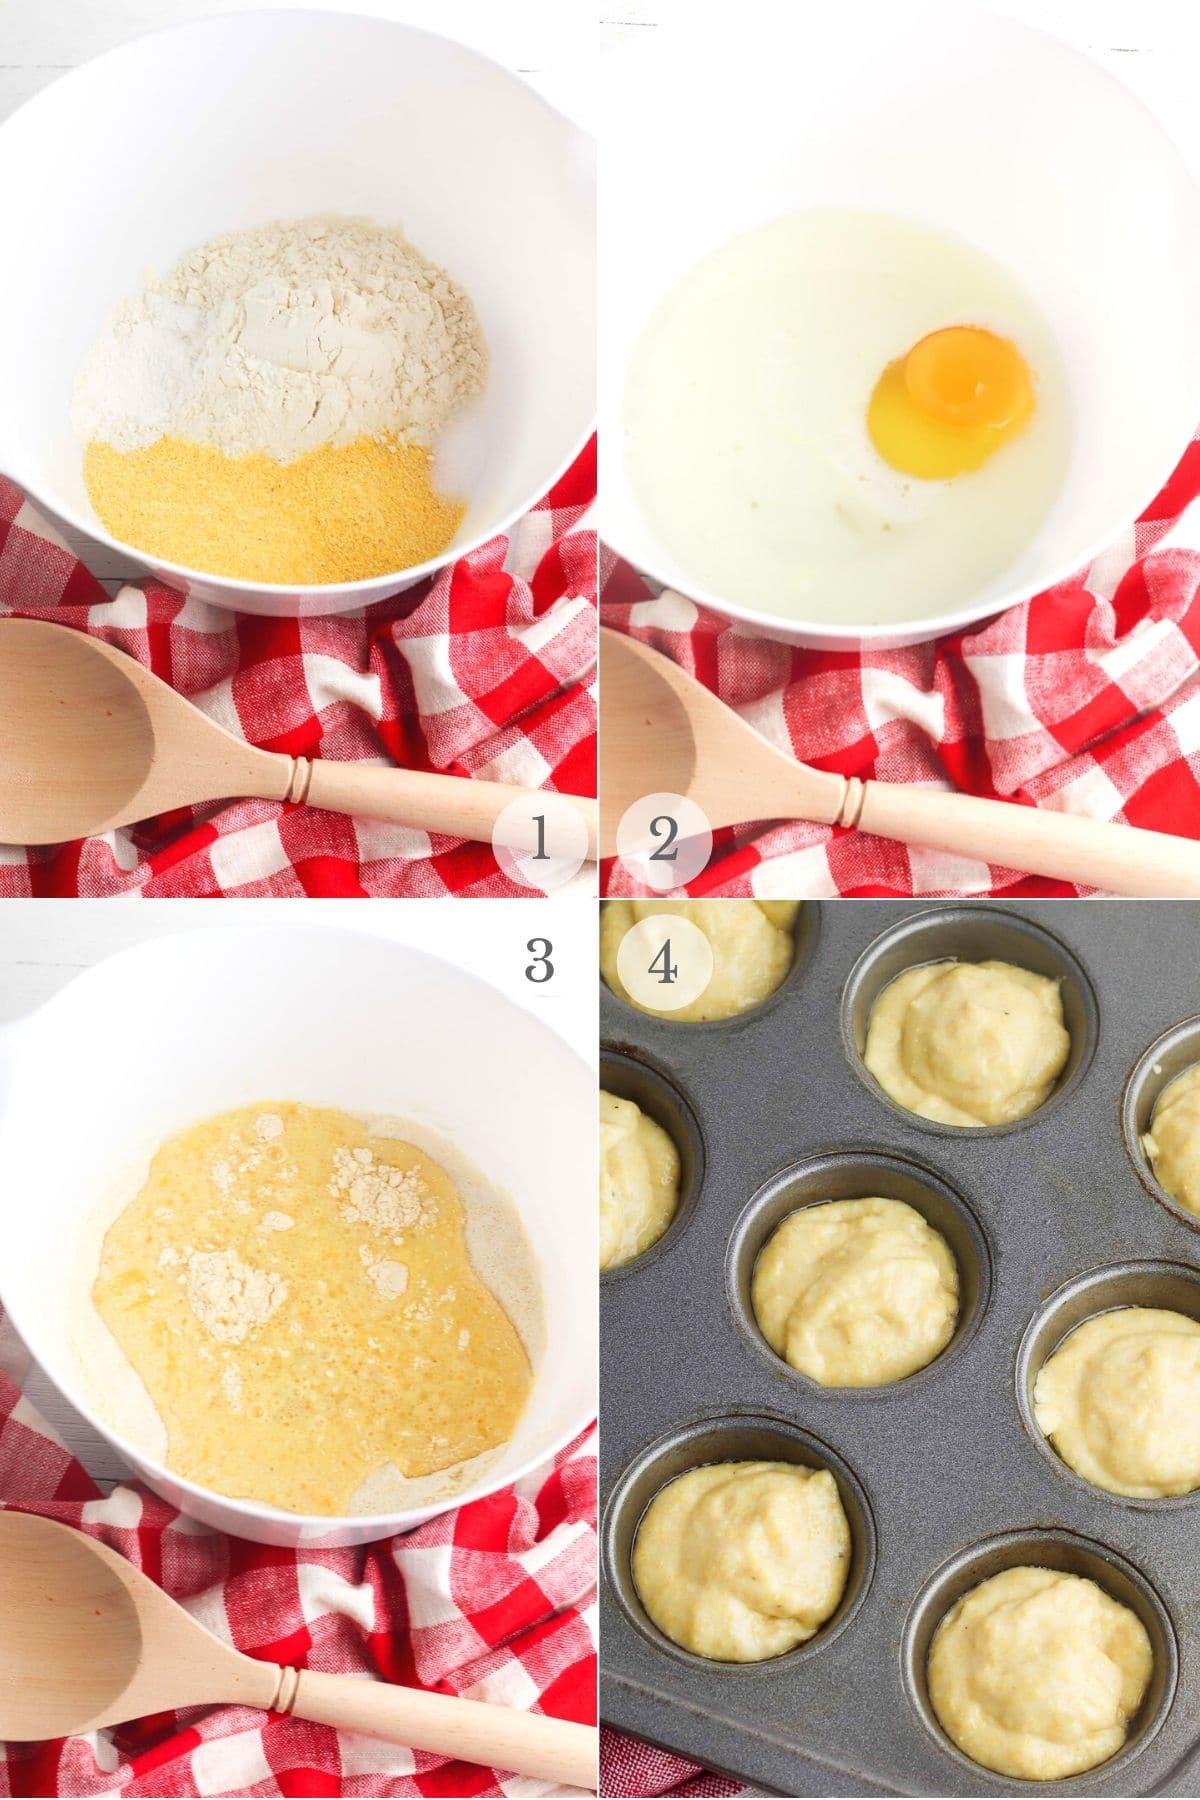 mini corn dog muffins recipe steps collage 1-4 (making batter)